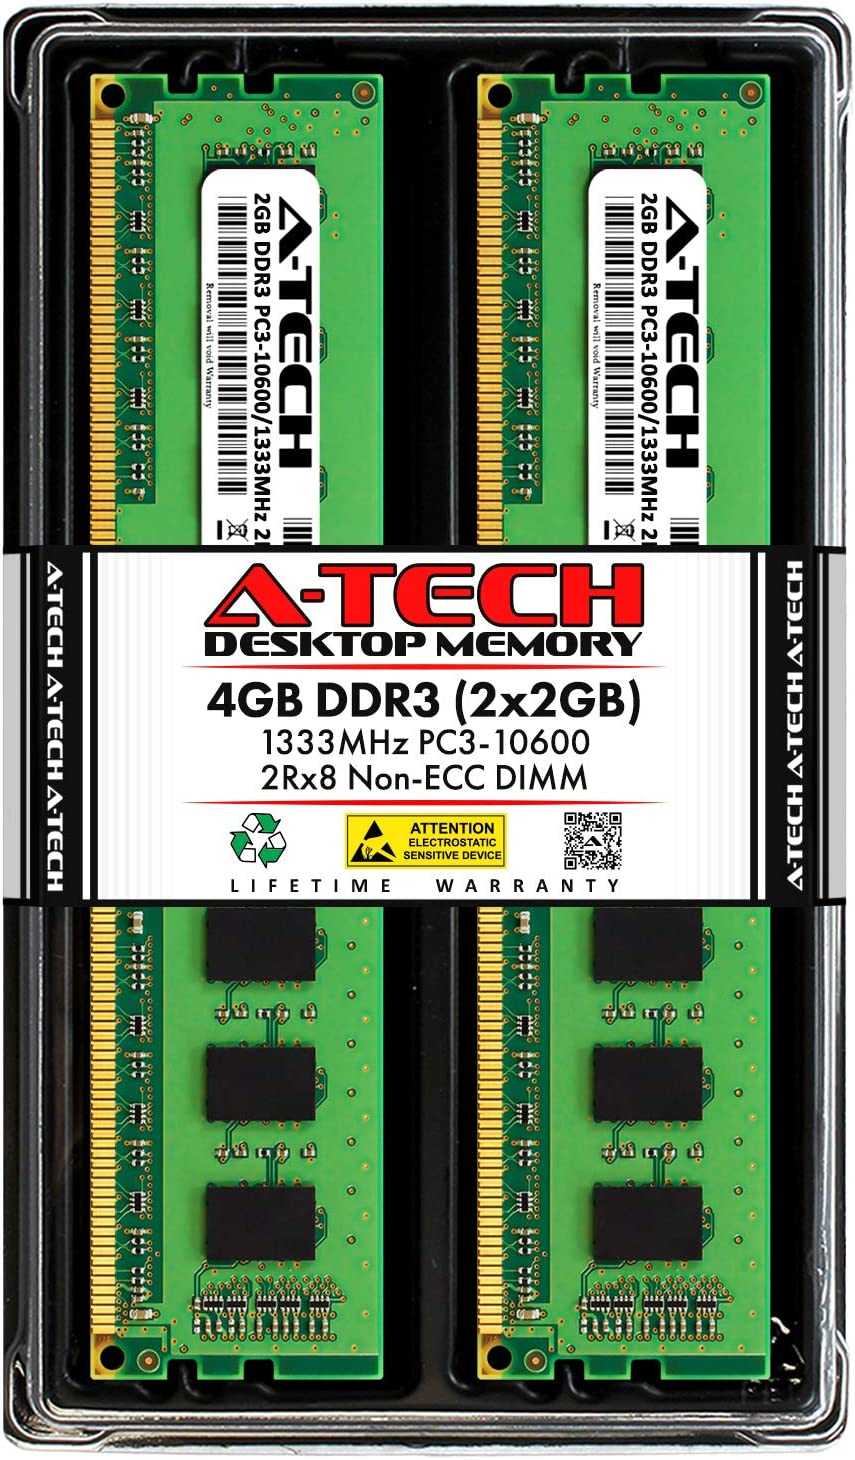 A-Tech 4GB DDR3 1333MHz Desktop Memory Kit (2 x 2GB) PC3-10600 Non-ECC Unbuffered DIMM 240-Pin 2Rx8 1.5V Dual Rank Computer RAM Upgrade Sticks